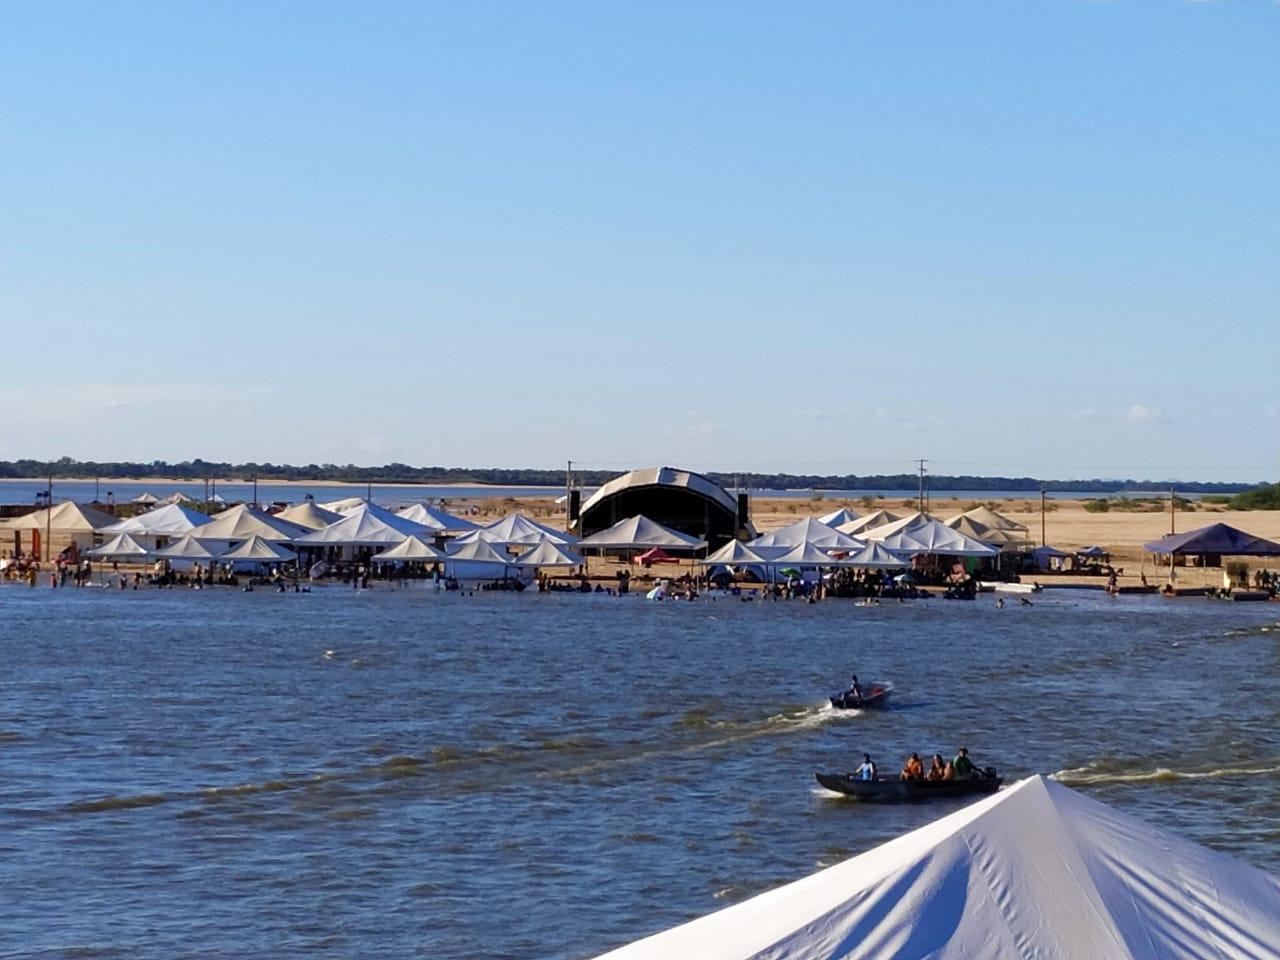 Abertura da temporada 2019 da Praia da Gaivota atrai turistas para Araguacema